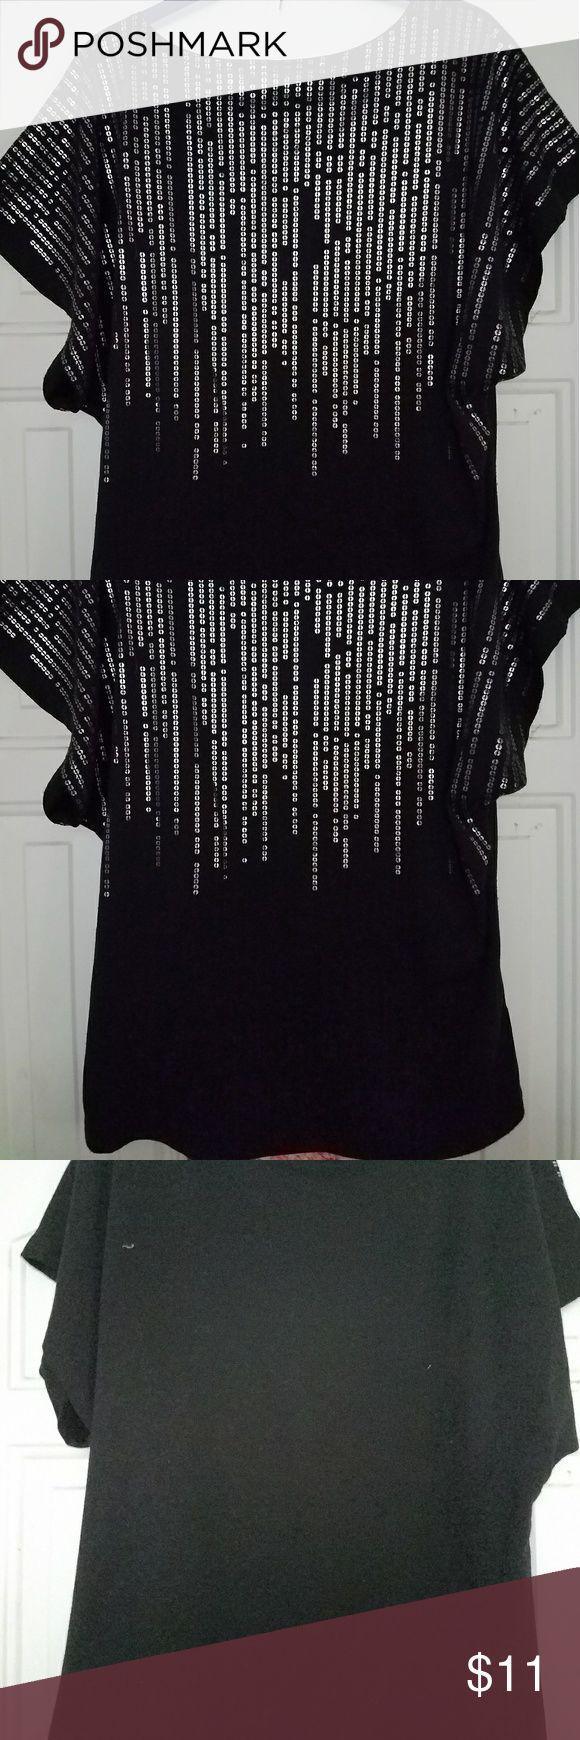 Vintage Suzie Black T-shirt black and silver short sleeve top Vintage Suzie Tops Tees - Short Sleeve